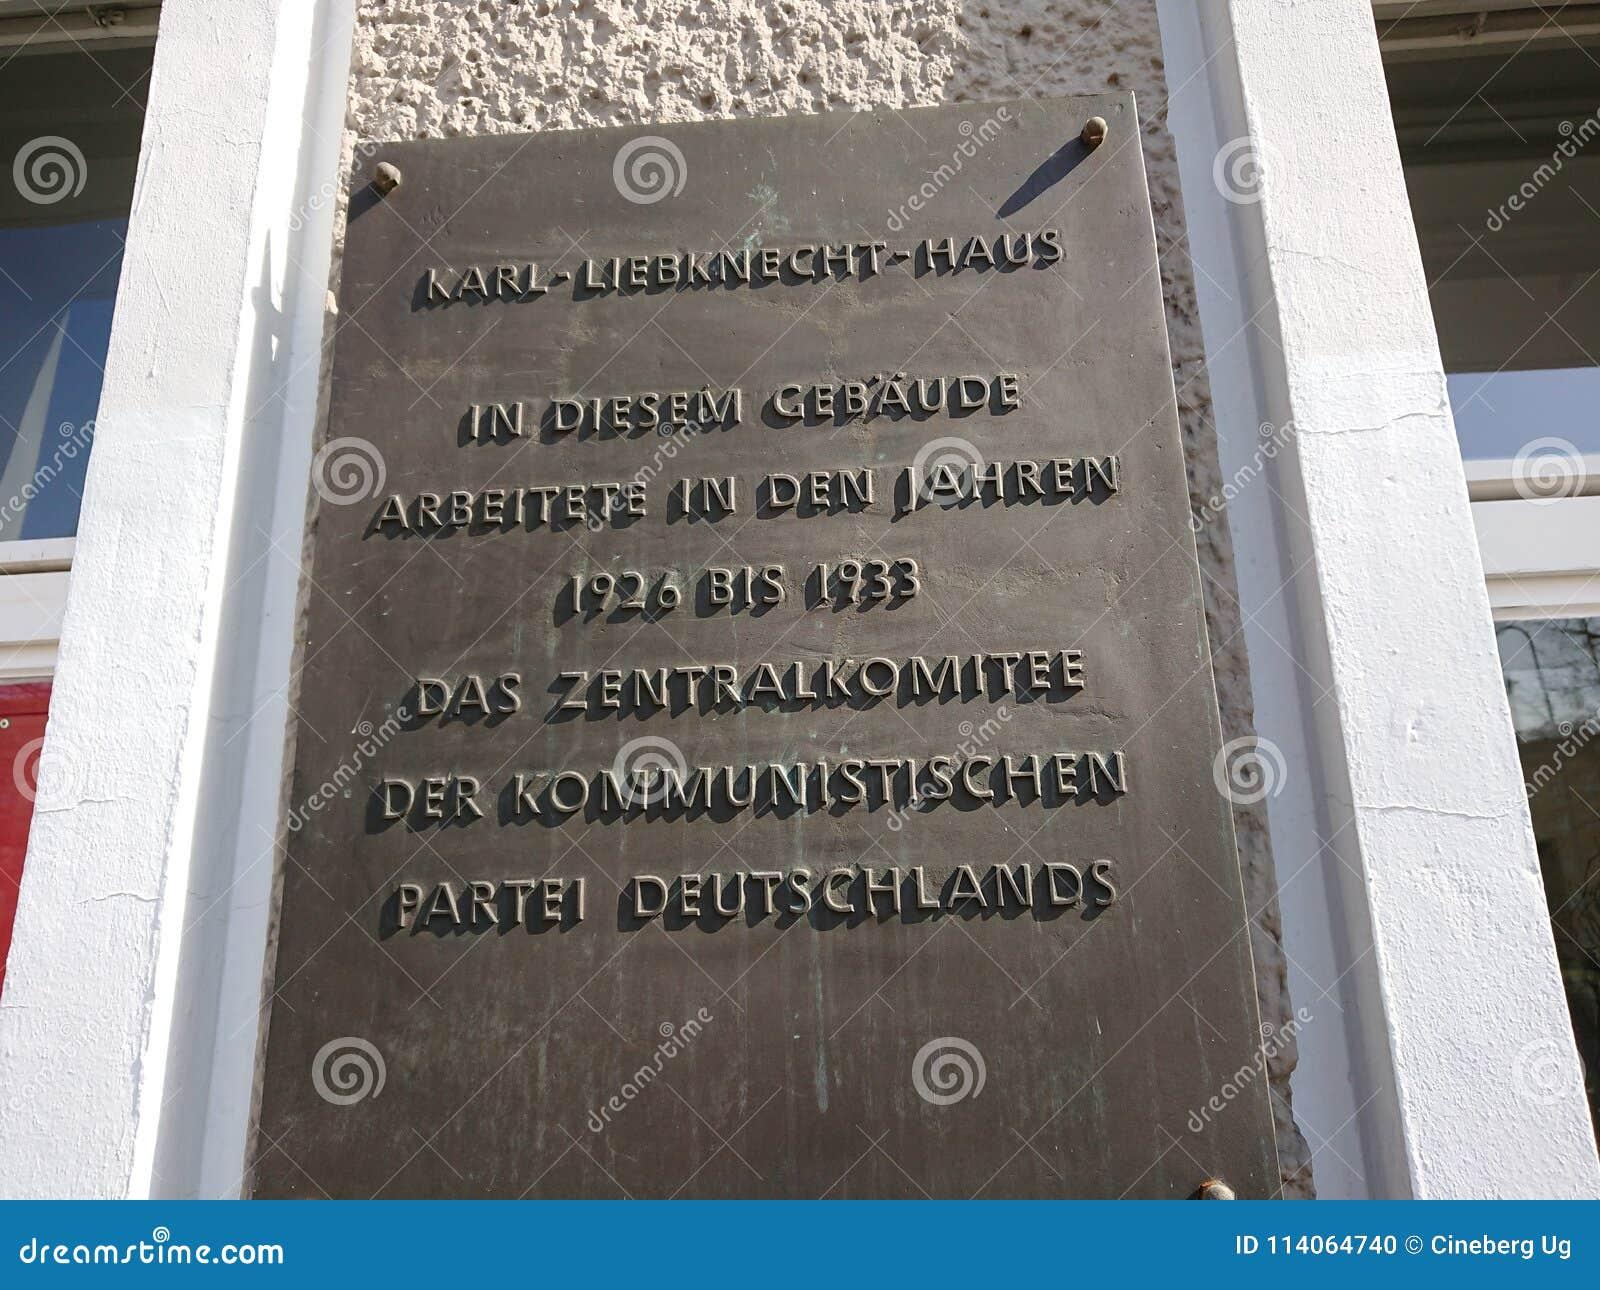 Karl Liebknecht House à Berlin, Allemagne